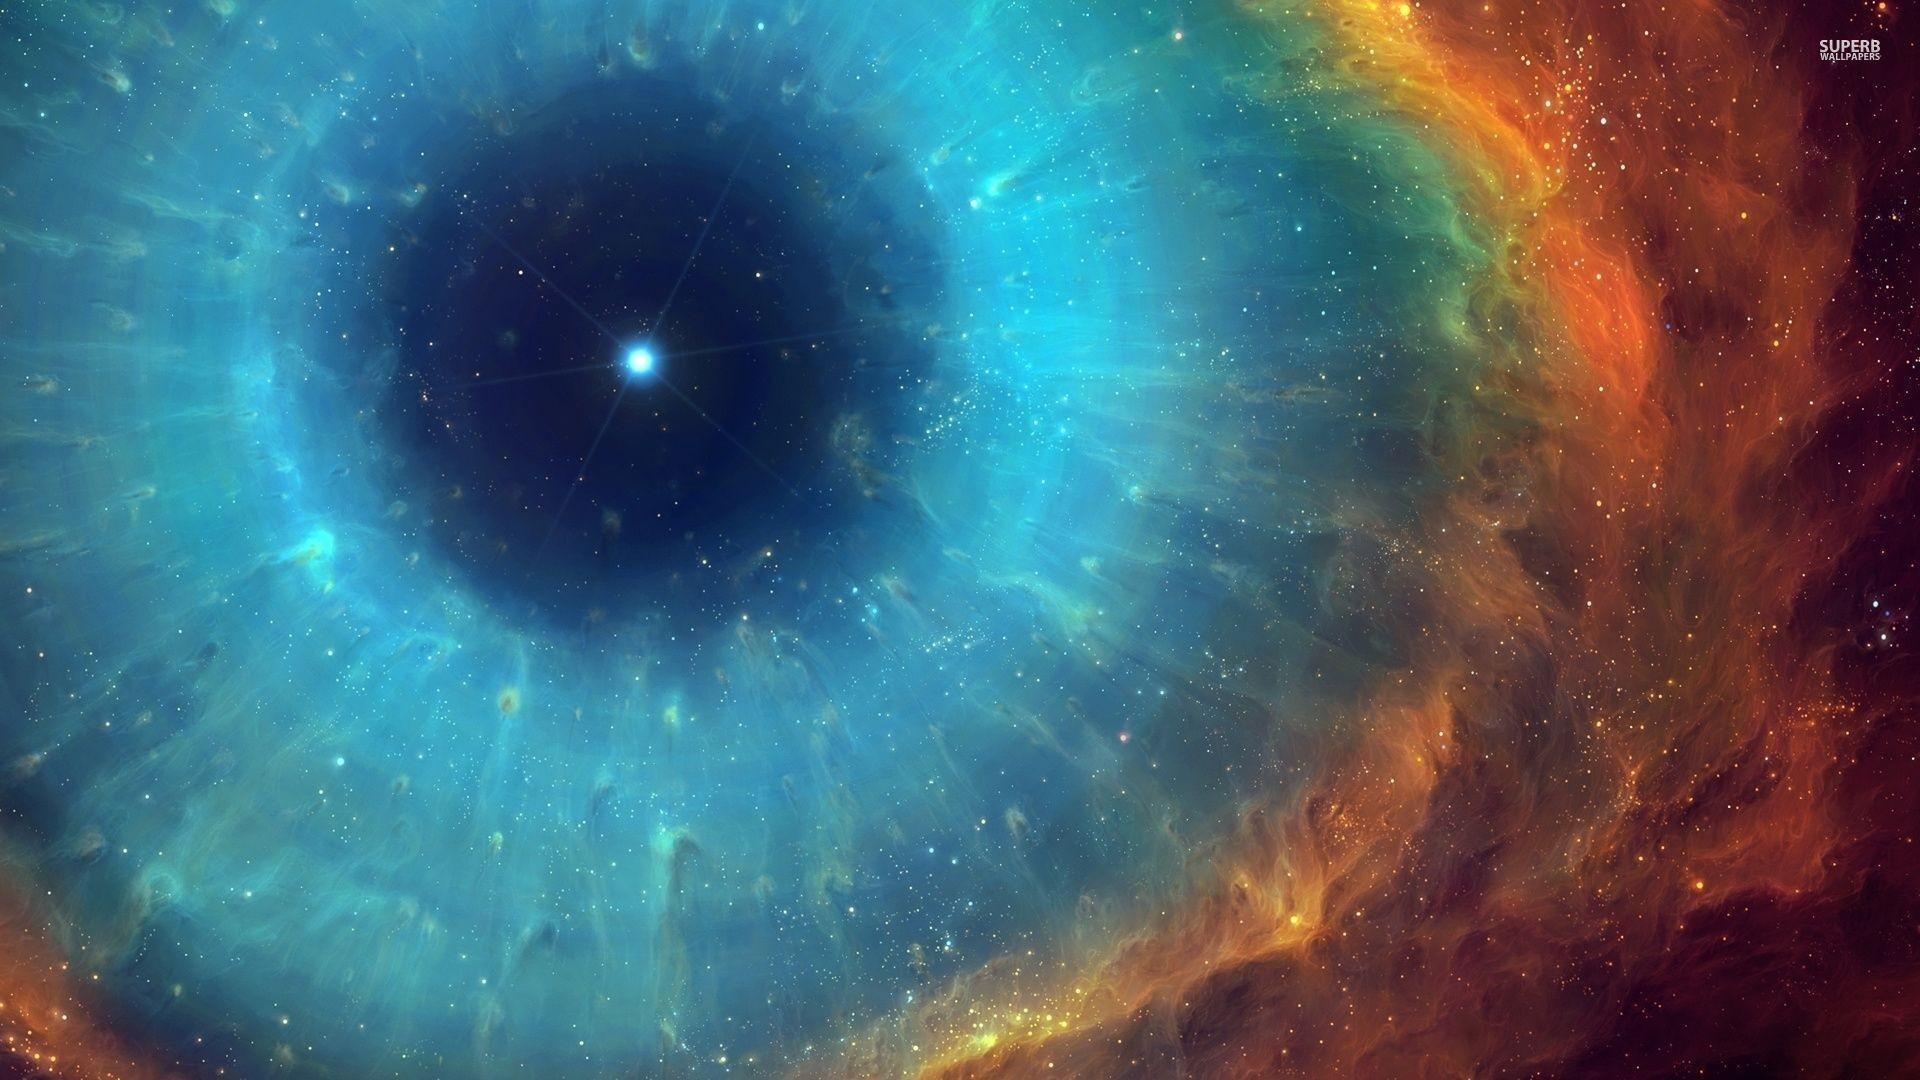 Eye of God Helix nebula wallpaper – Space wallpapers – #48629